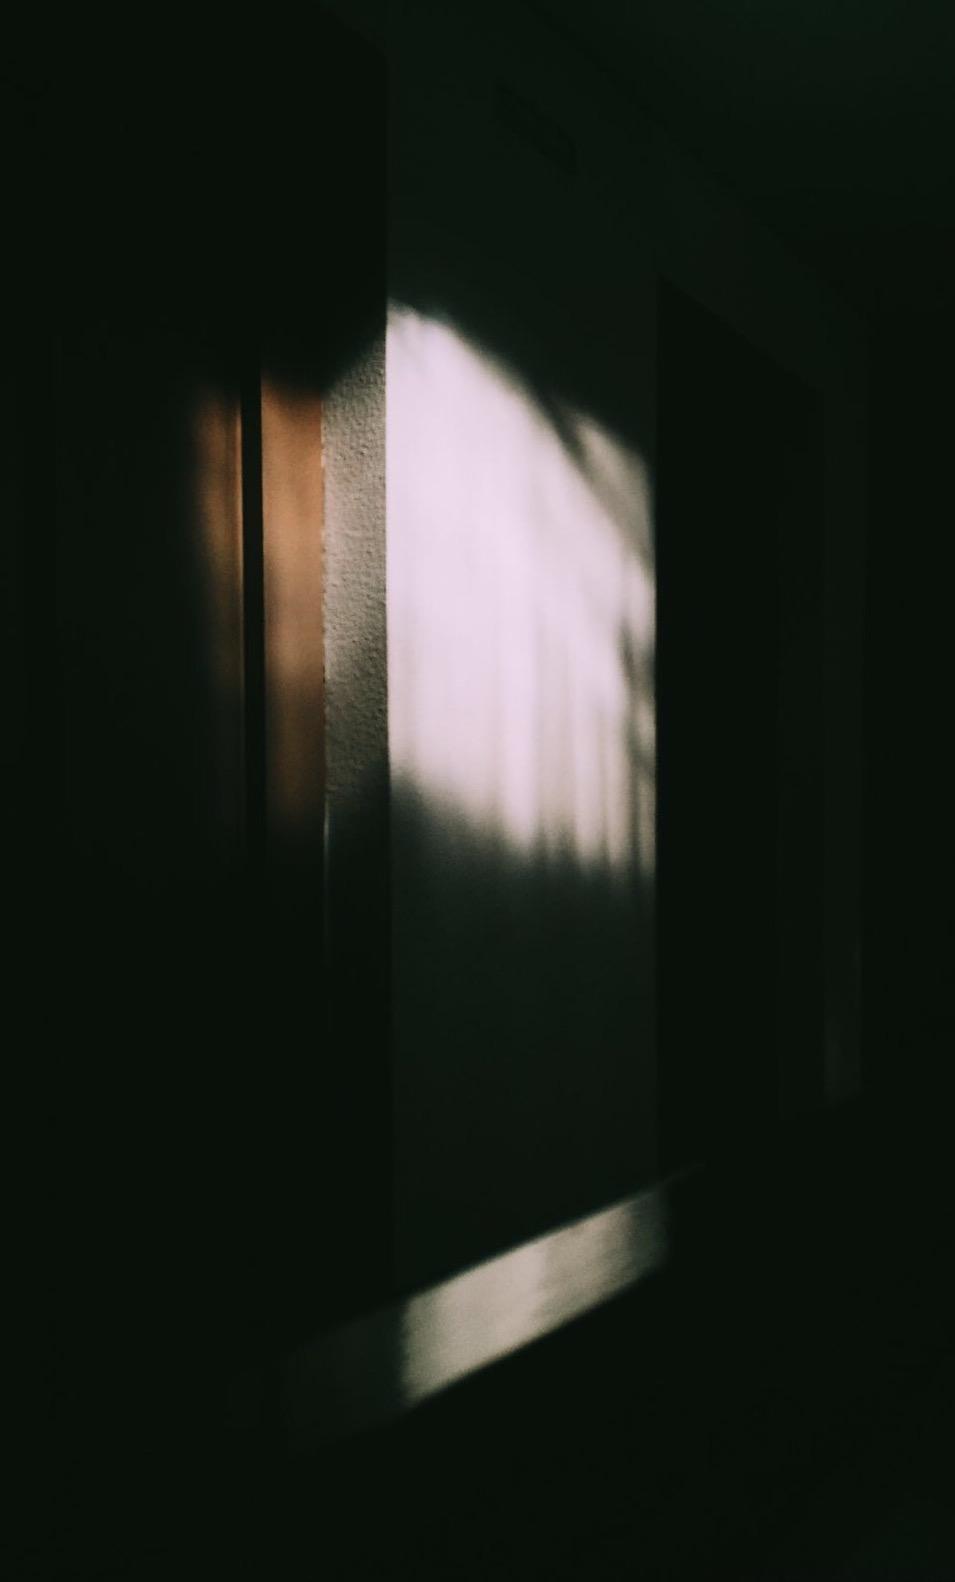 Foto 20.11.16, 12 34 45.jpg